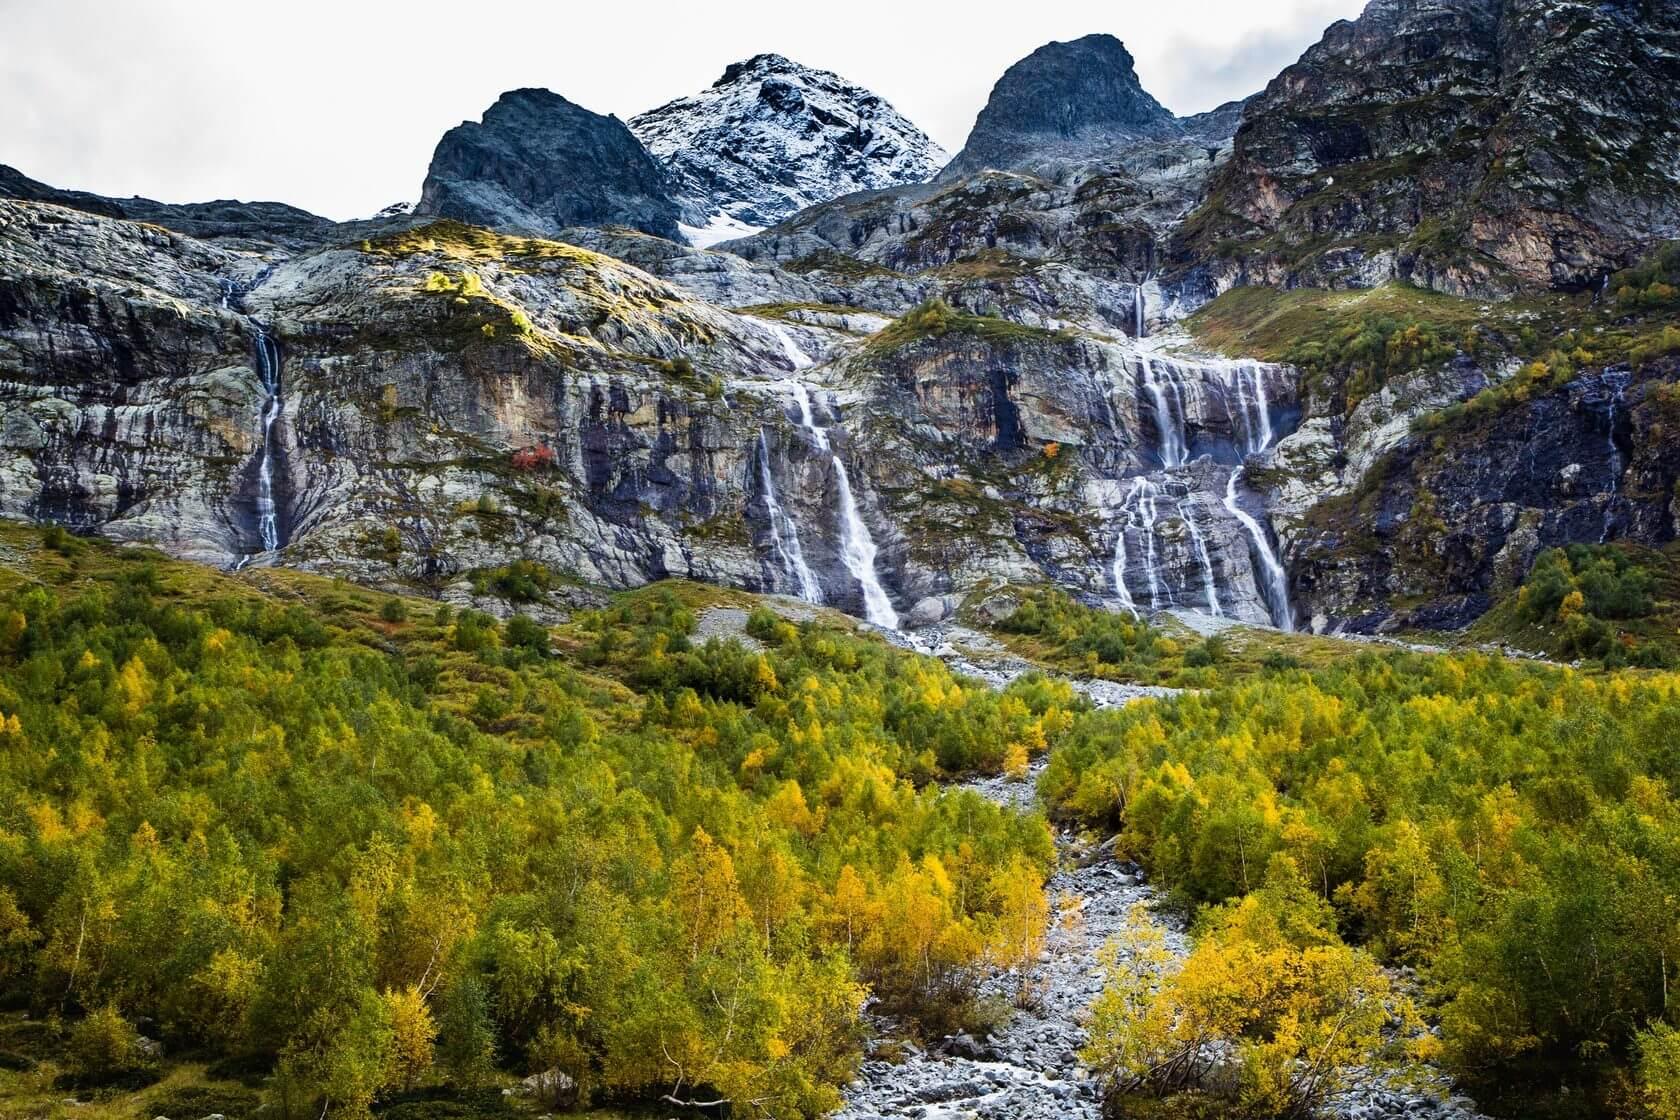 Софийские водопады архыз